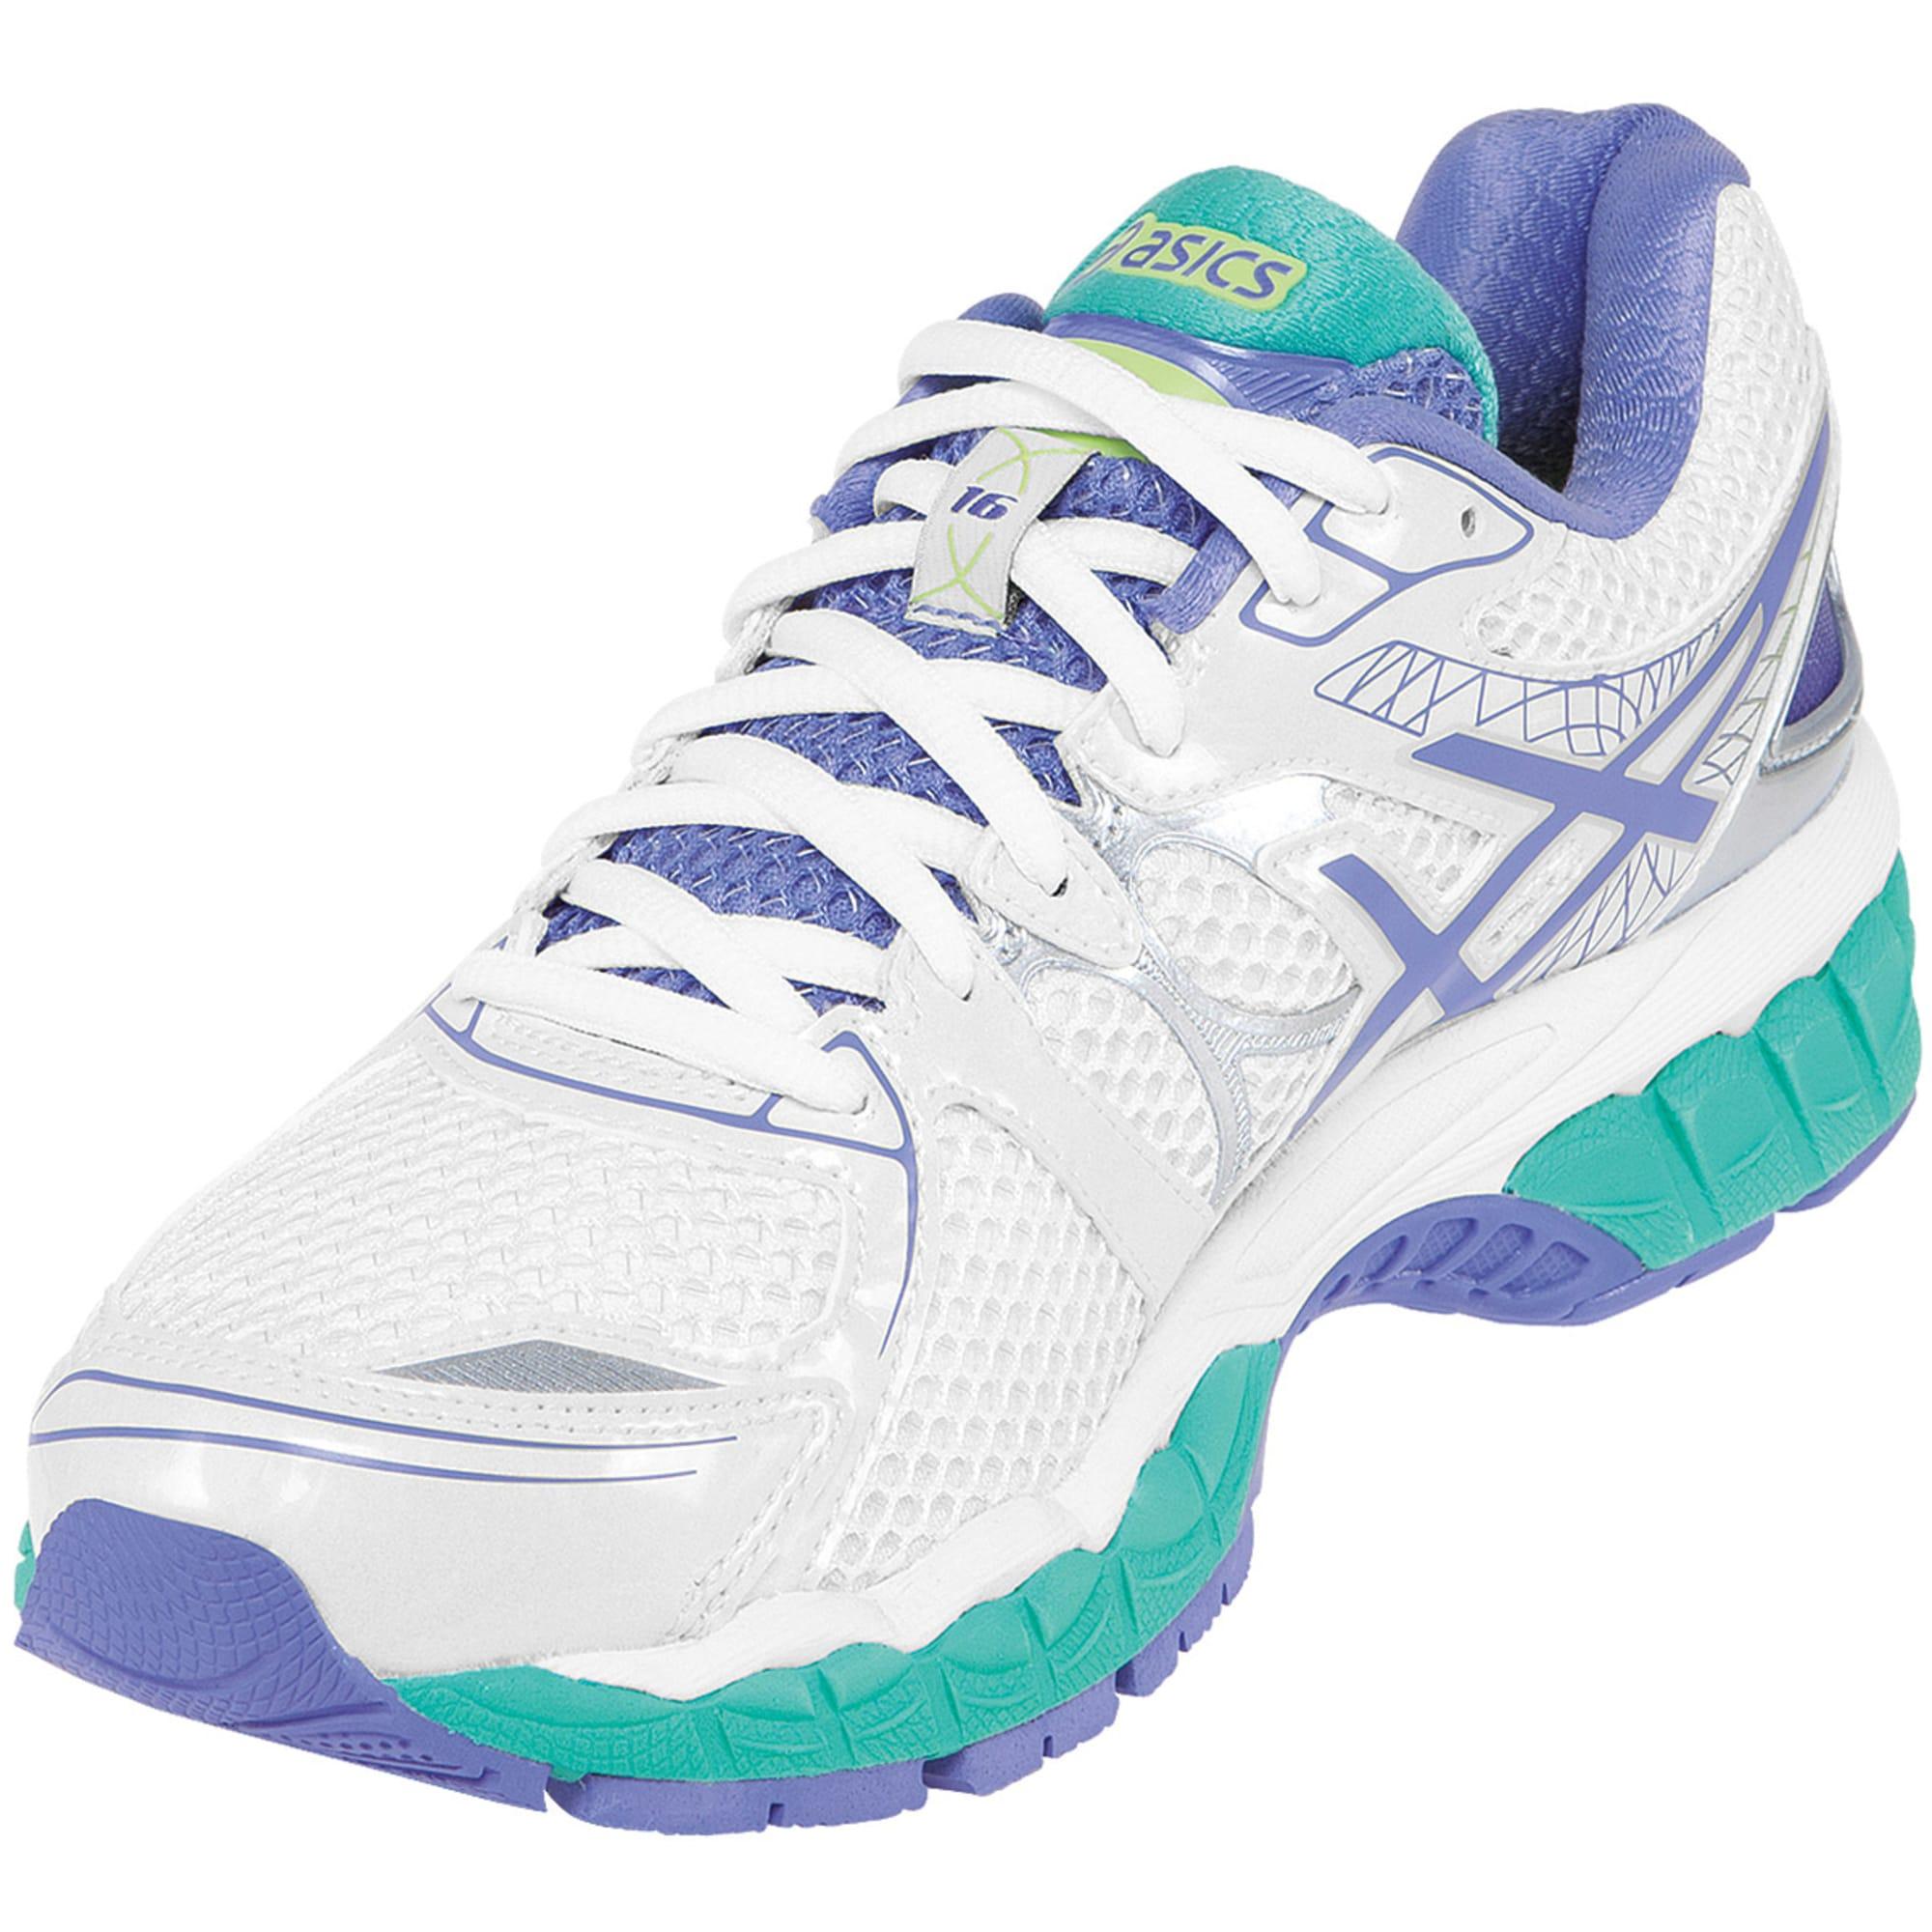 Oso polar fuerte casual  ASICS Women's Gel Nimbus 16 Running Shoes - Bob's Stores